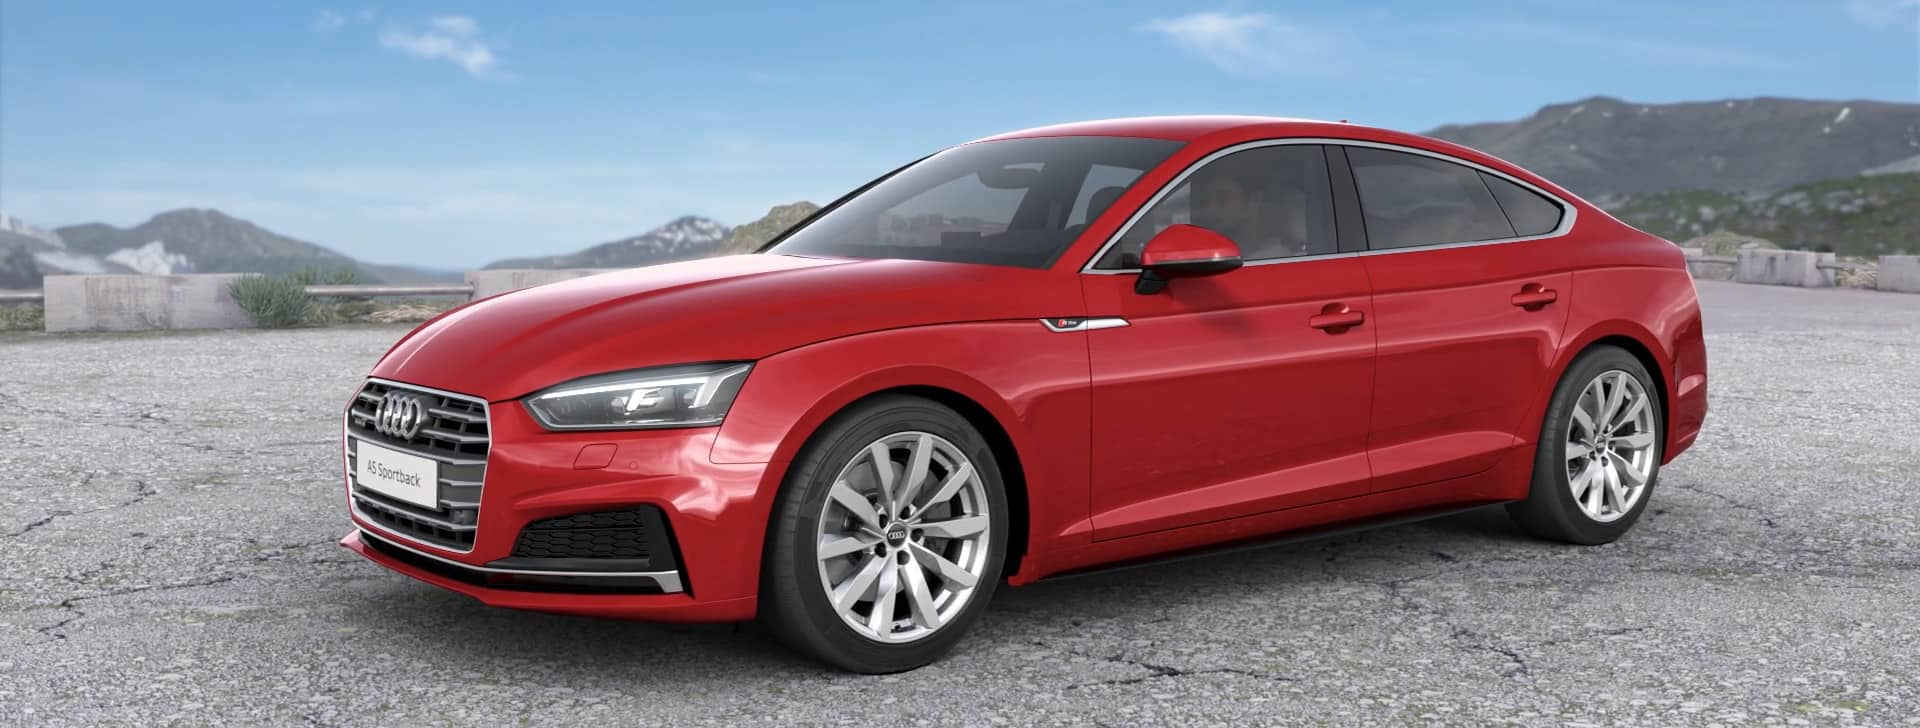 A5 Sportback 2019 Audi A5 2019 Audi Middle East